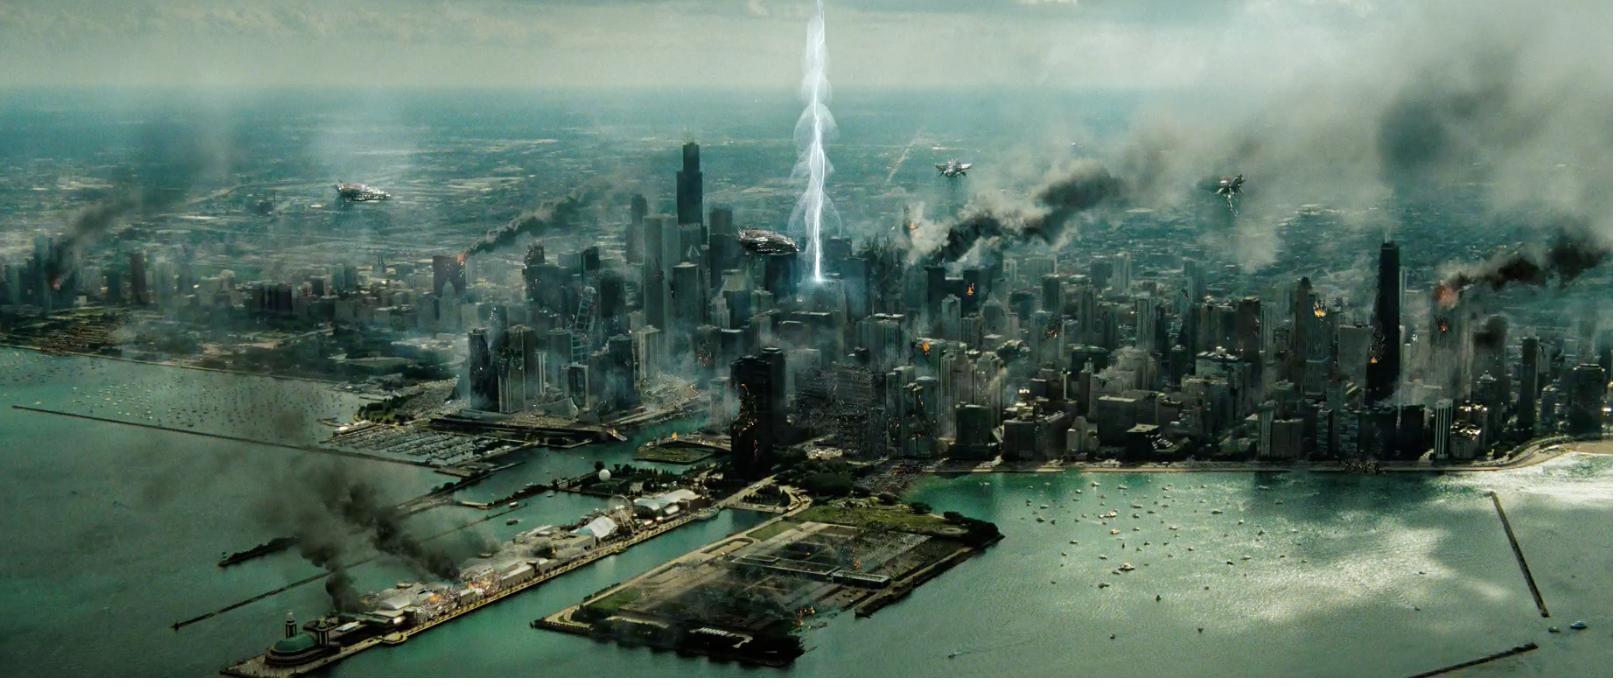 destroyed city evangelion | Post apocalyptic city ... |Future Destroyed City